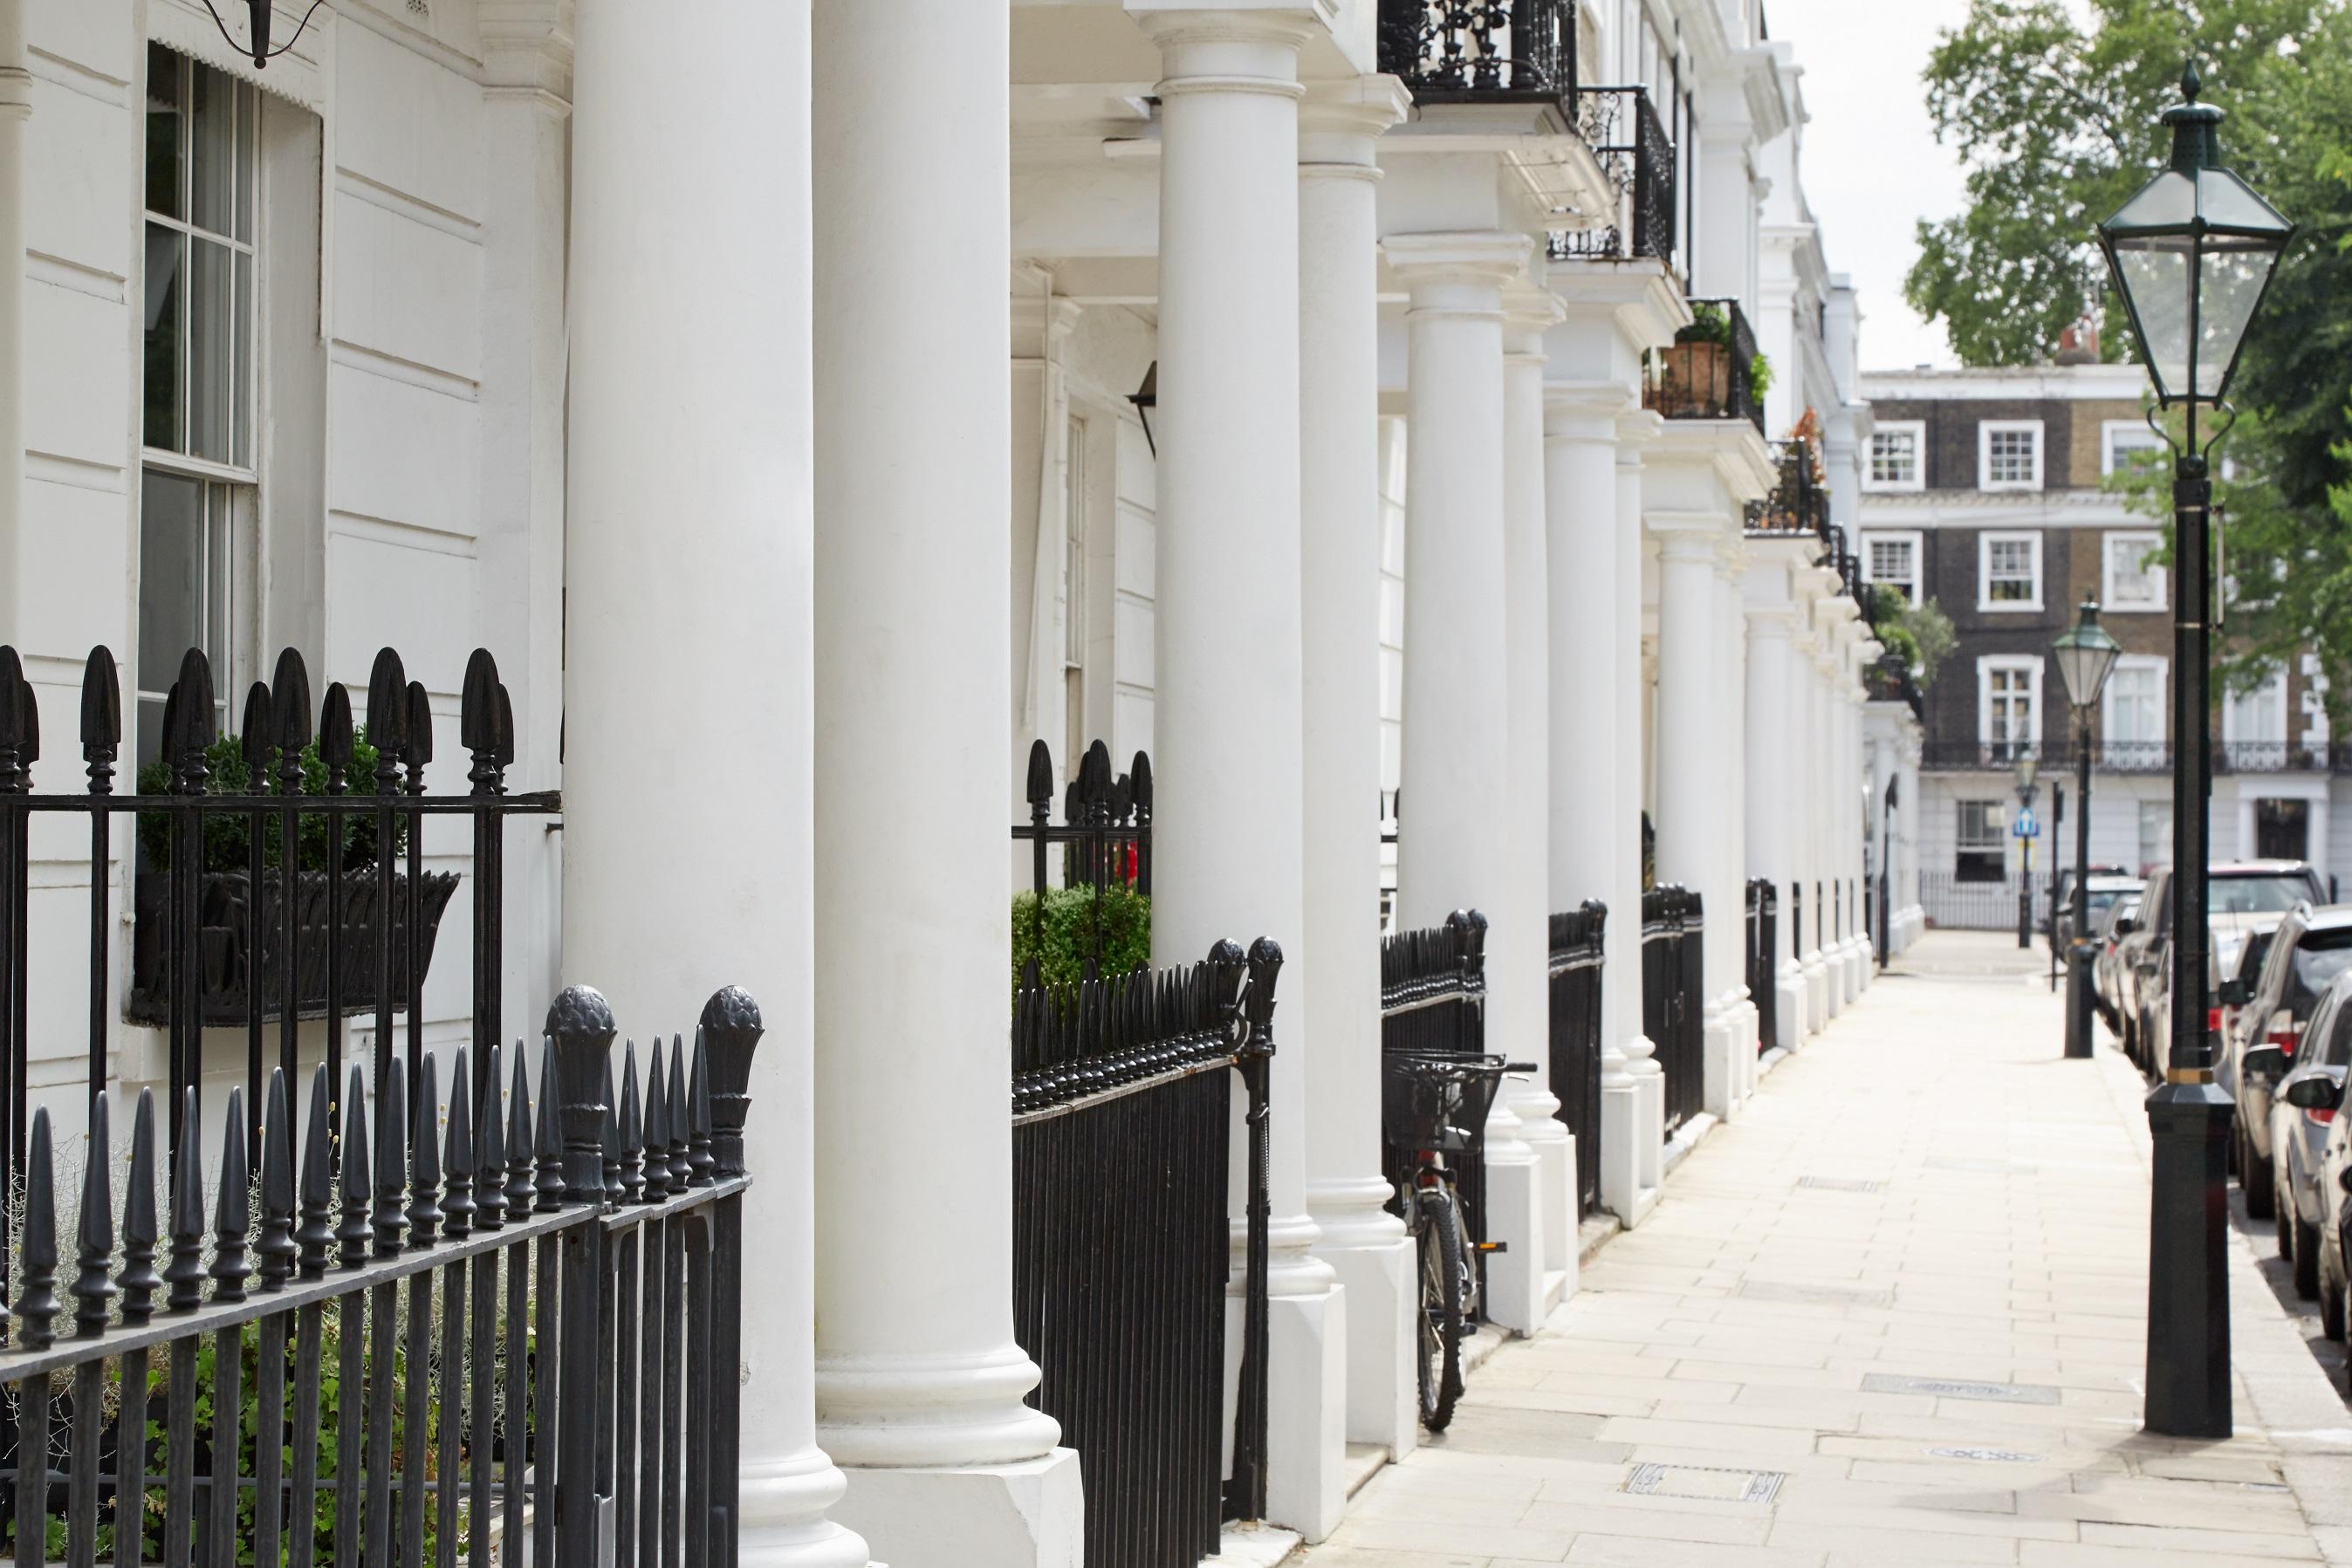 Selecting and viewing London rental properties